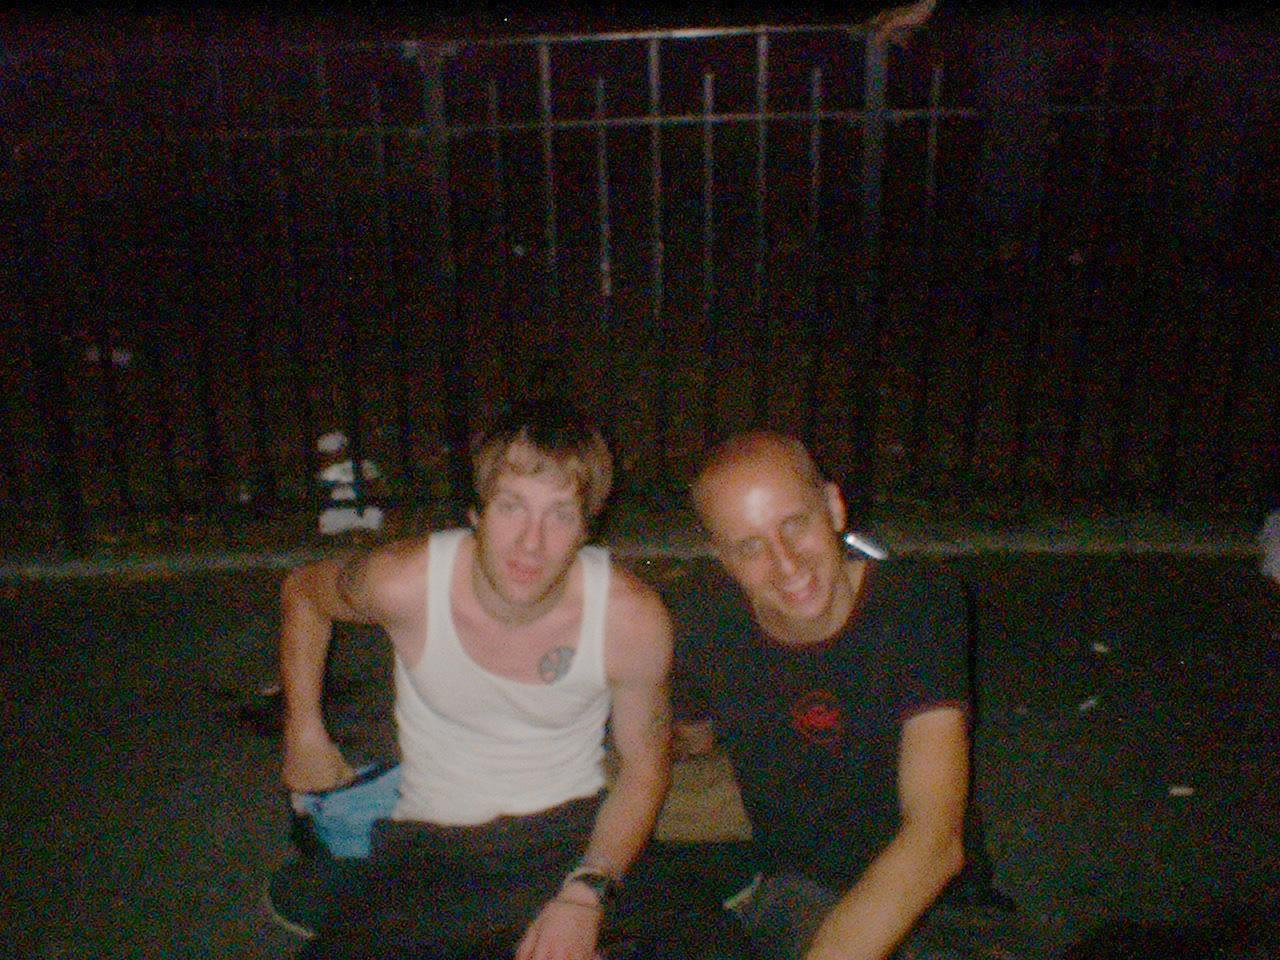 Shaggy & Normal Bob